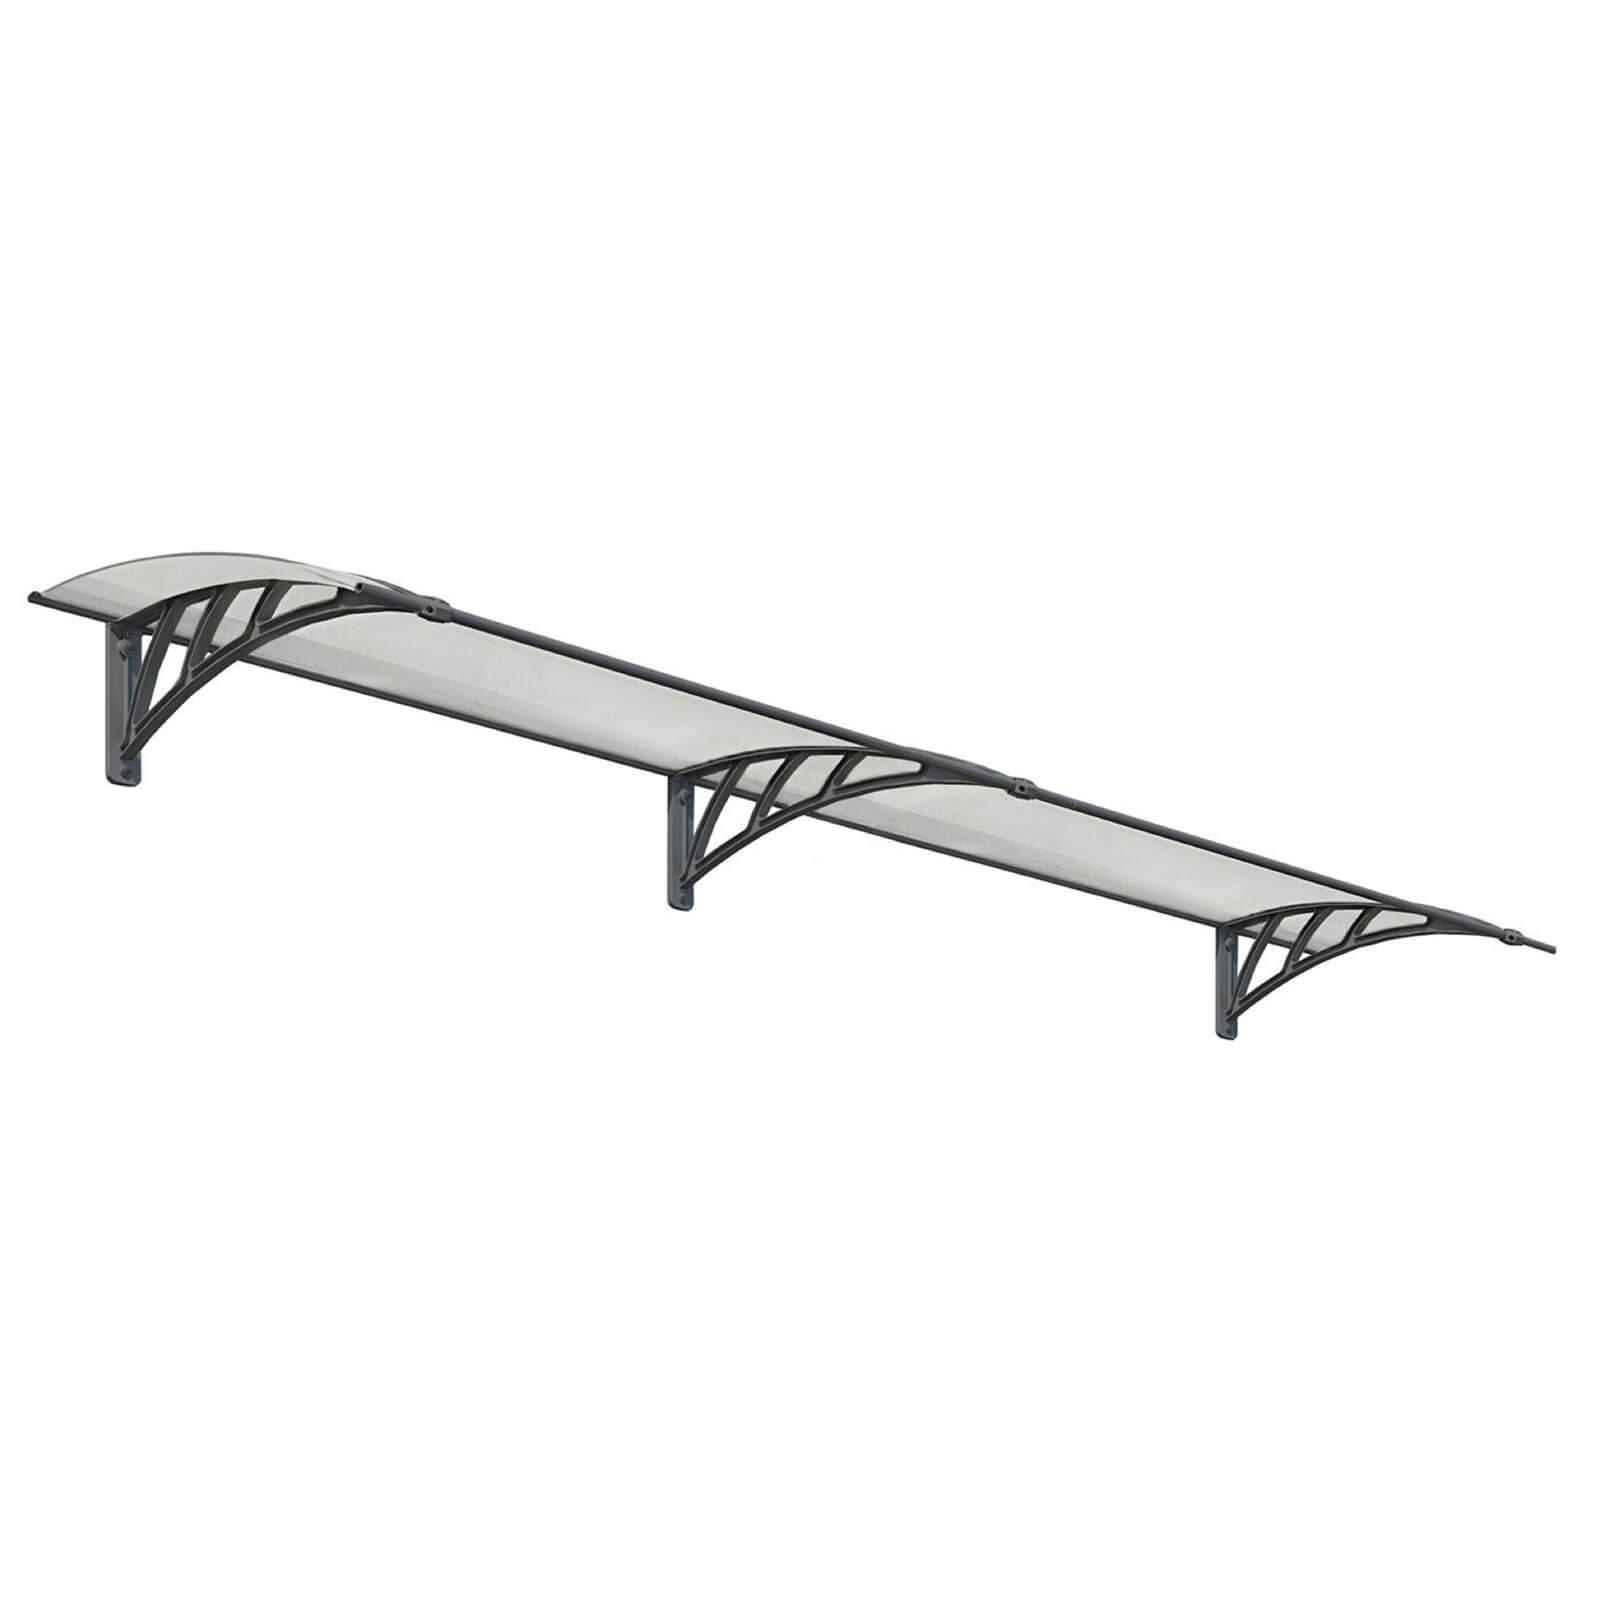 Palram - Canopia Canopy Neo 2700 Grey Twinwall